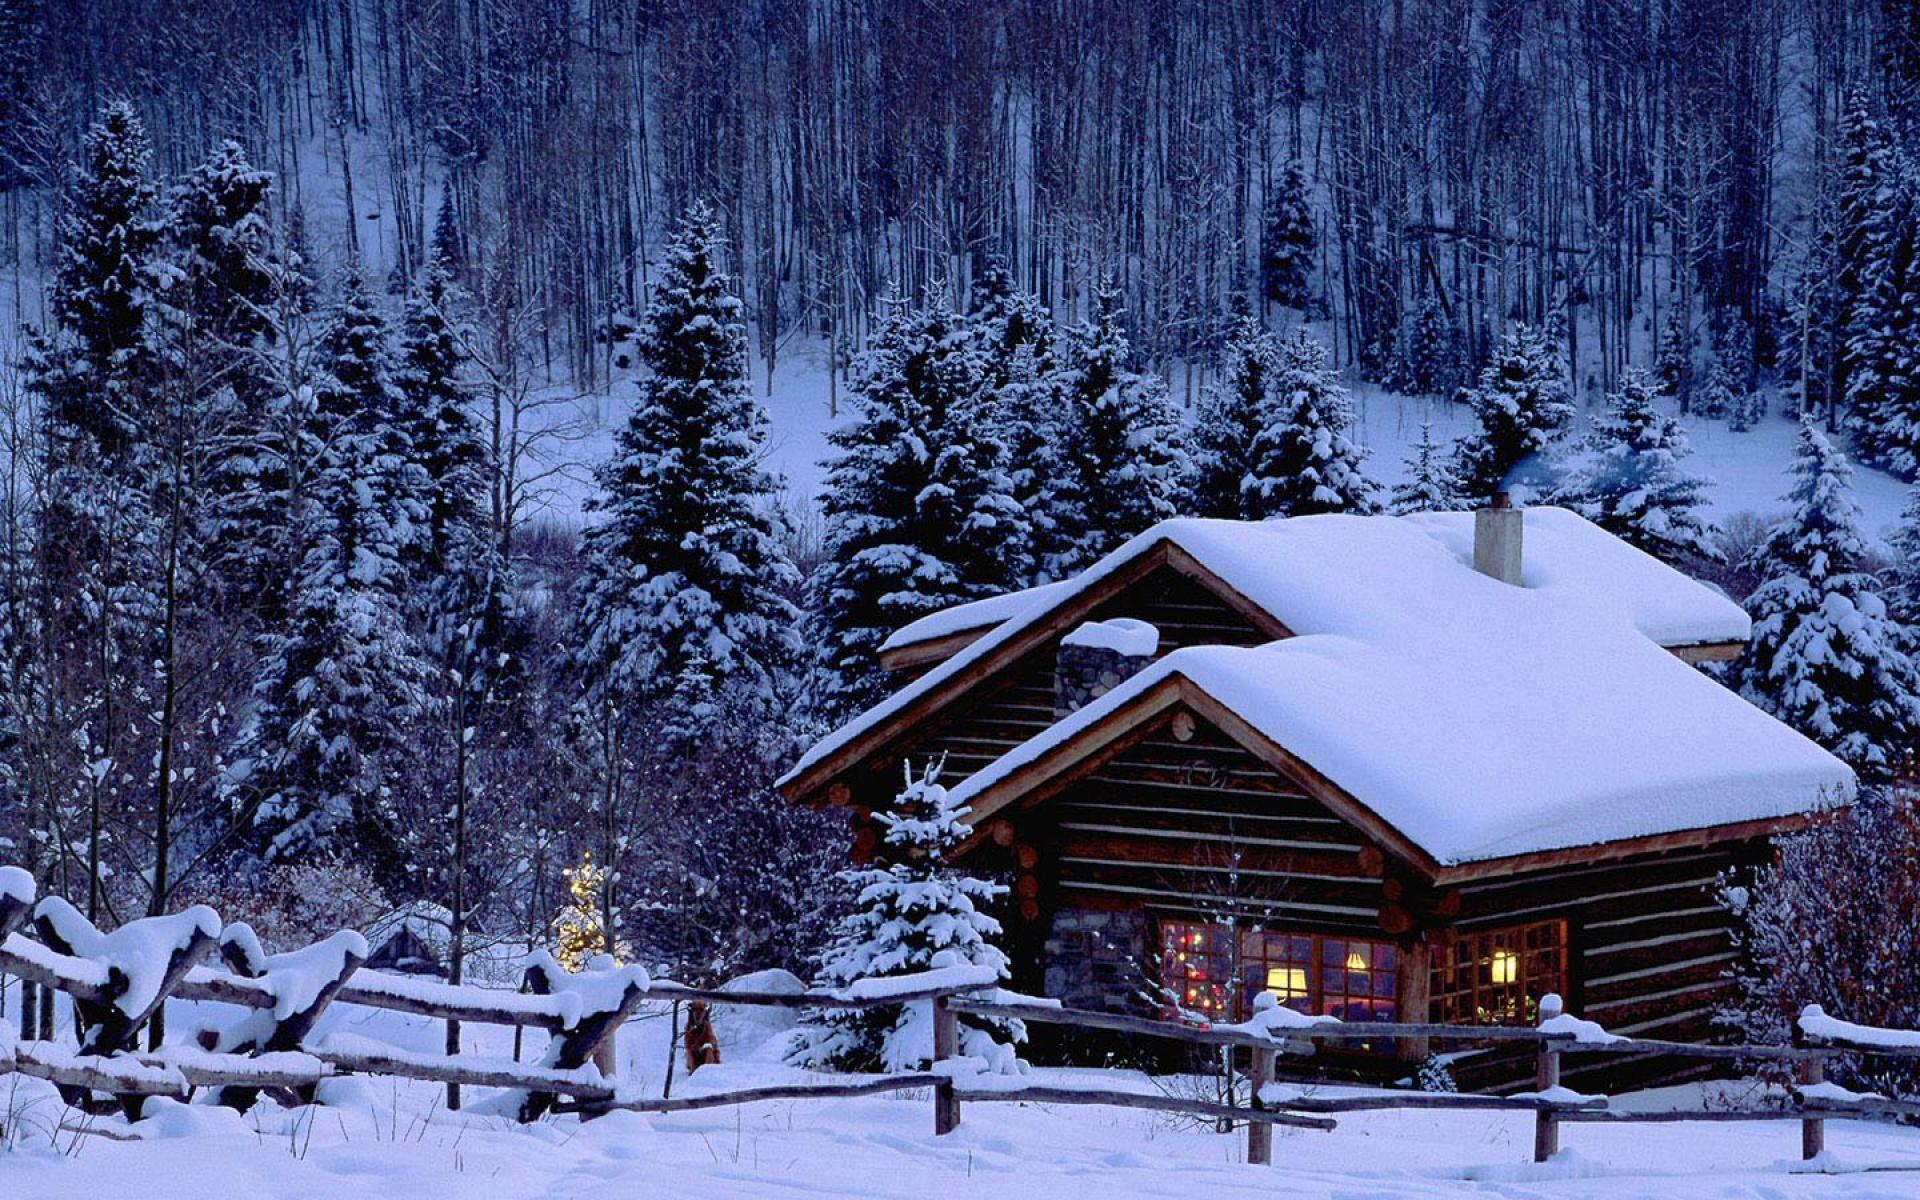 dreamy, scene, snow, wallpaper, scenery, warmly, house